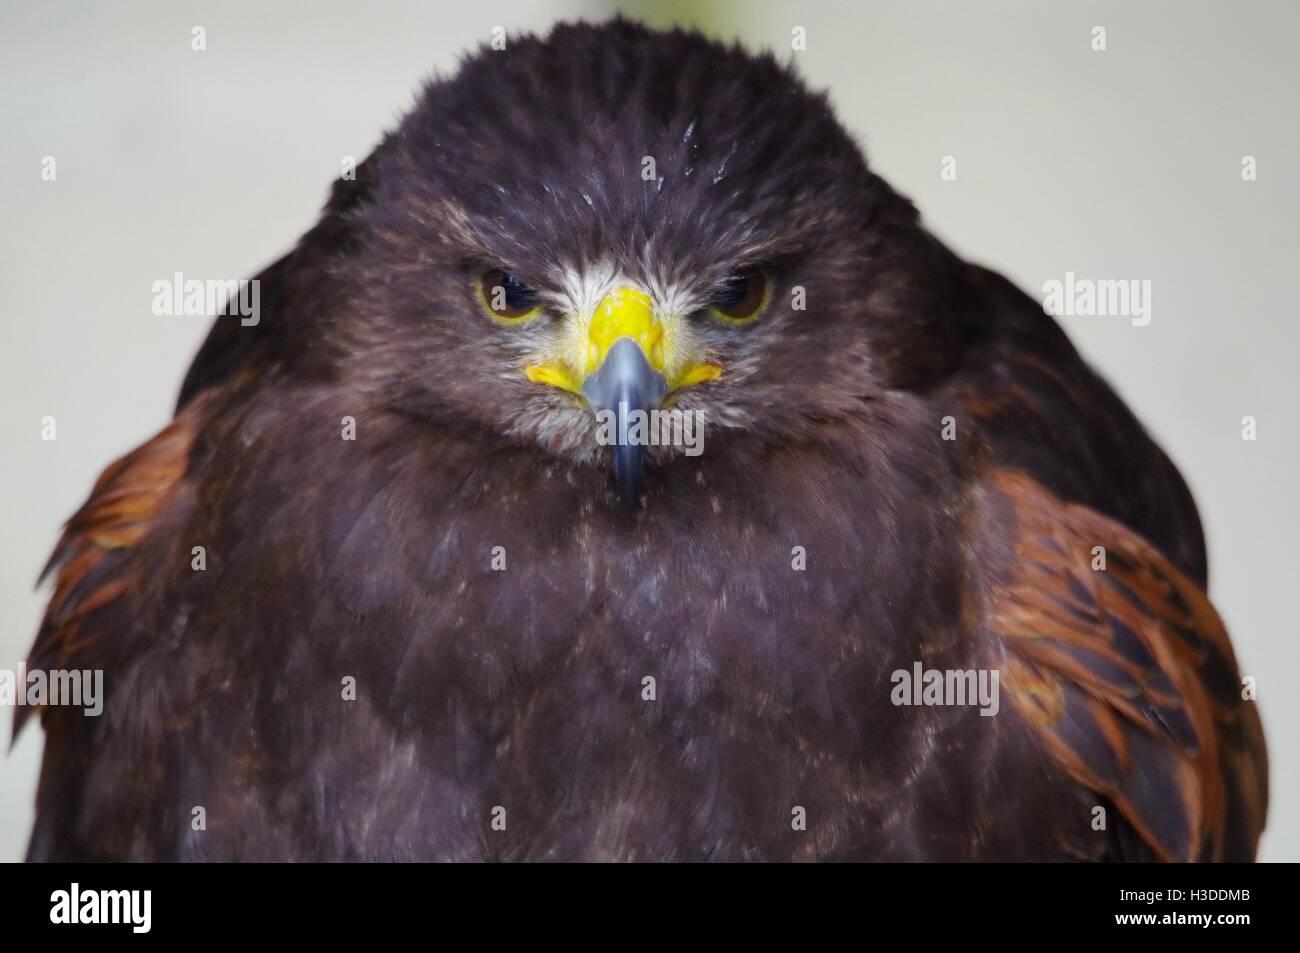 angry Harris hawk - Stock Image